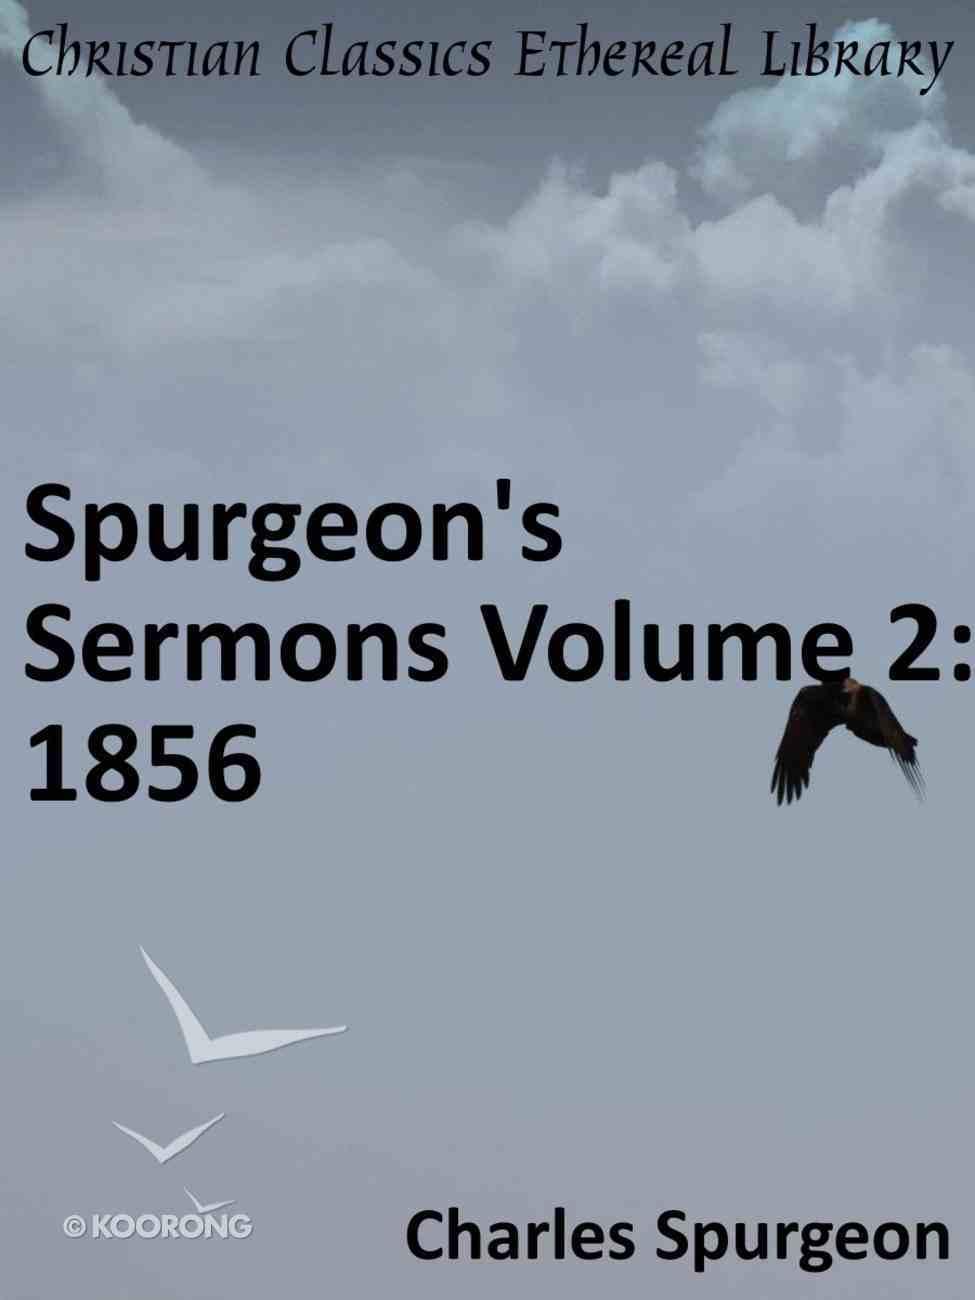 Spurgeon's Sermons Volume 2: 1856 eBook